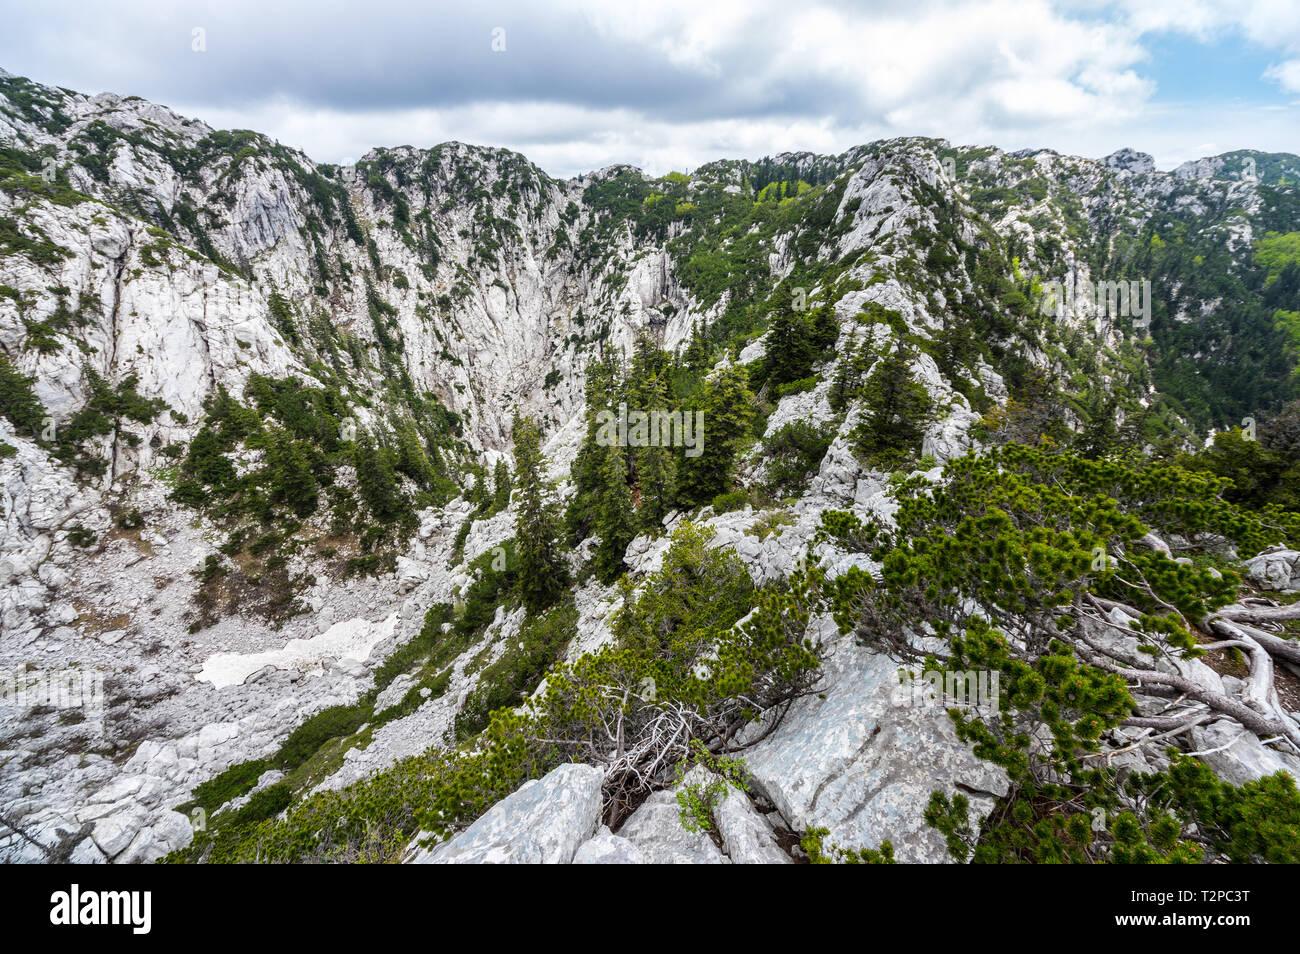 National park Sjeverni Velebit, Croatia Stock Photo